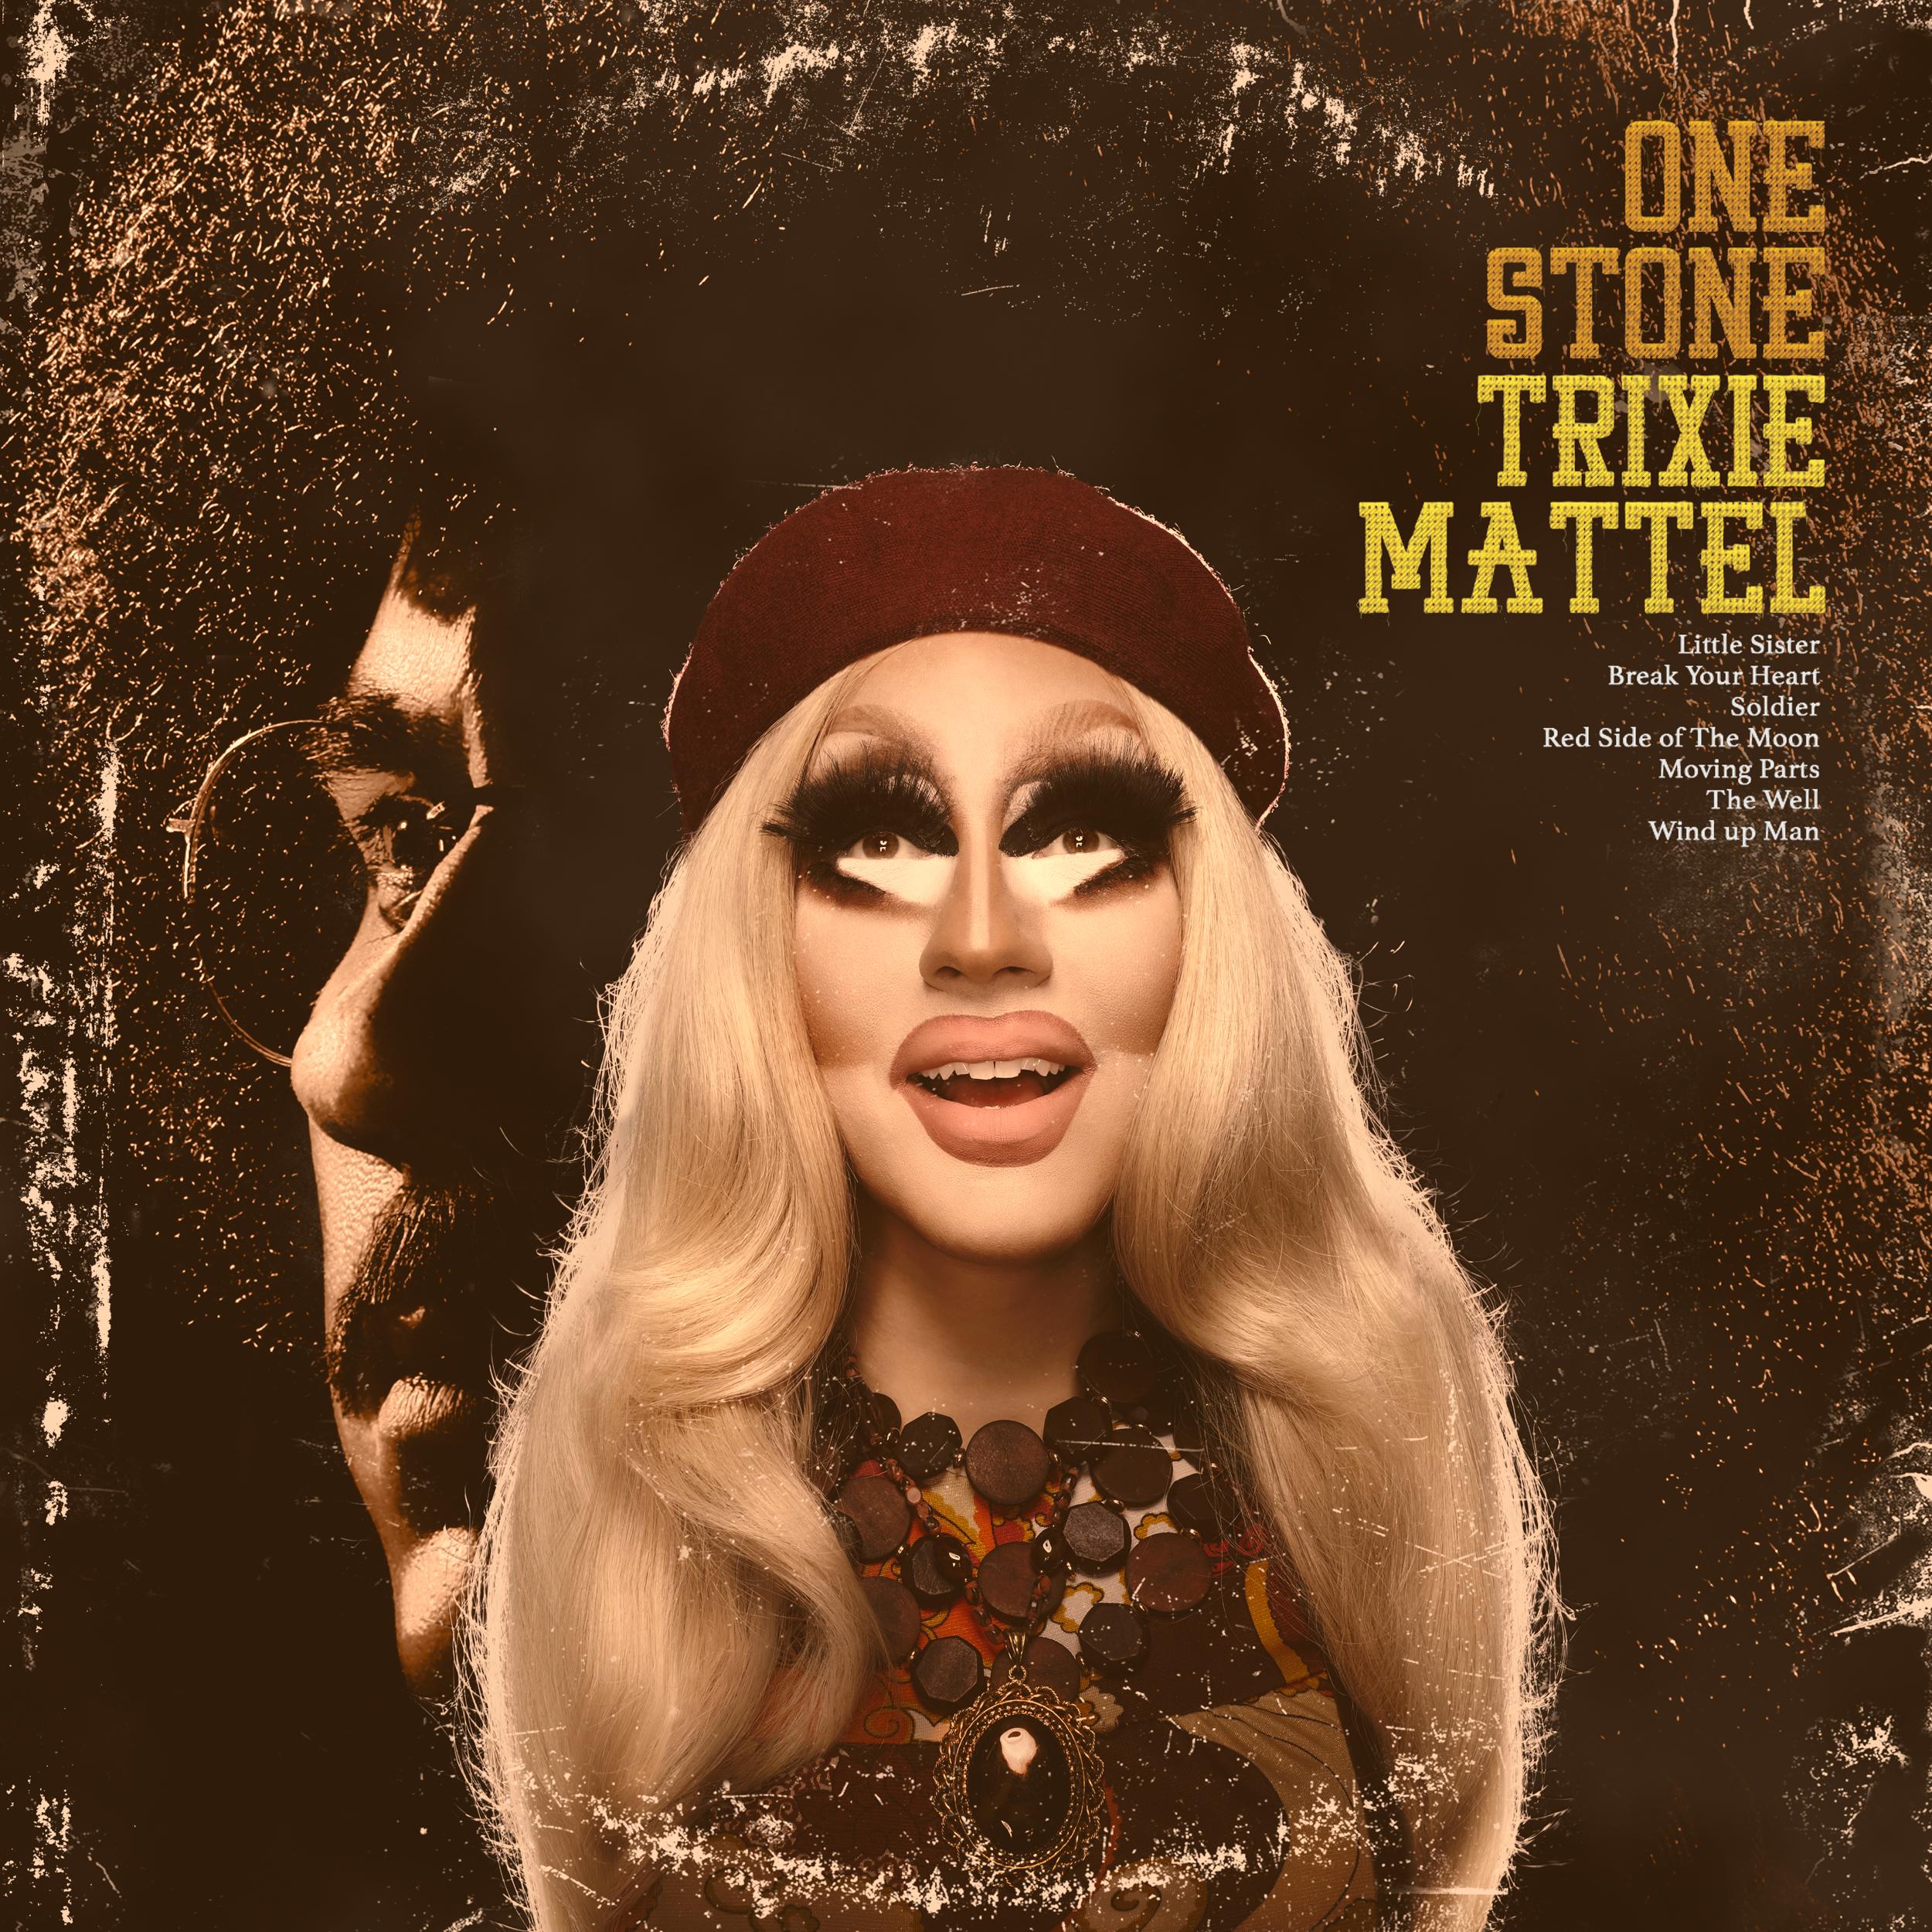 Trixie Mattel - Lisa Predko